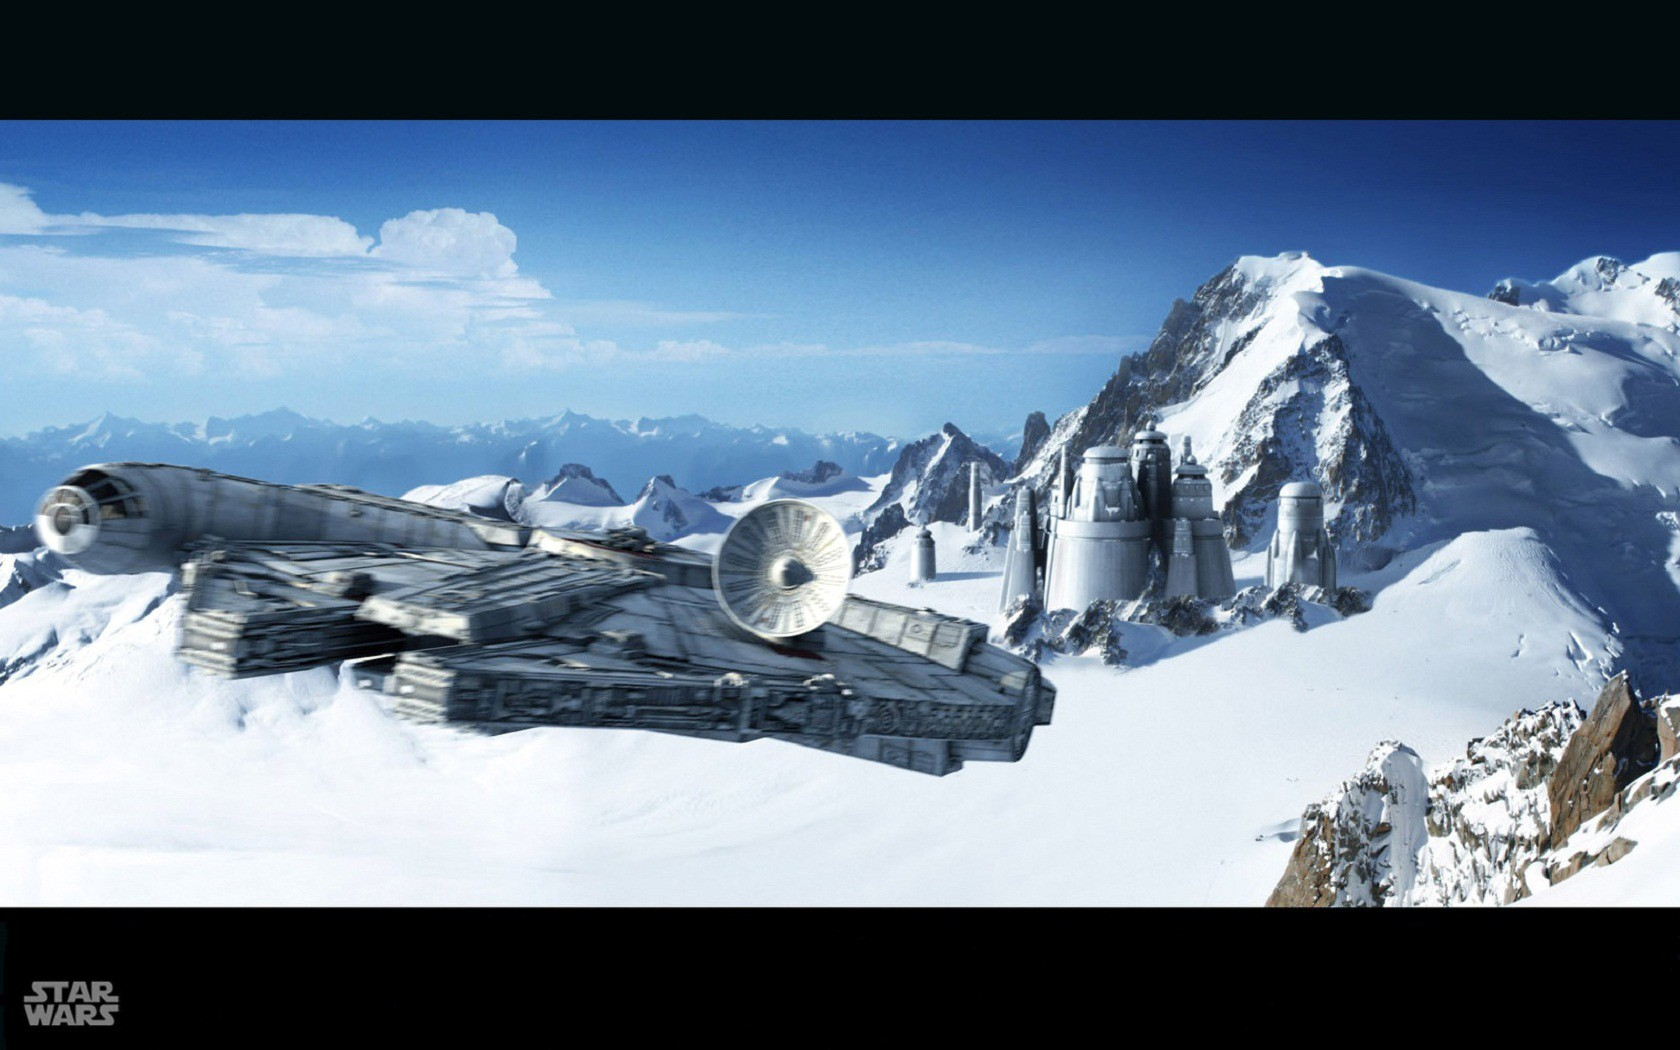 Free Download Star Wars Wallpaper 1680x1050 Star Wars Millennium